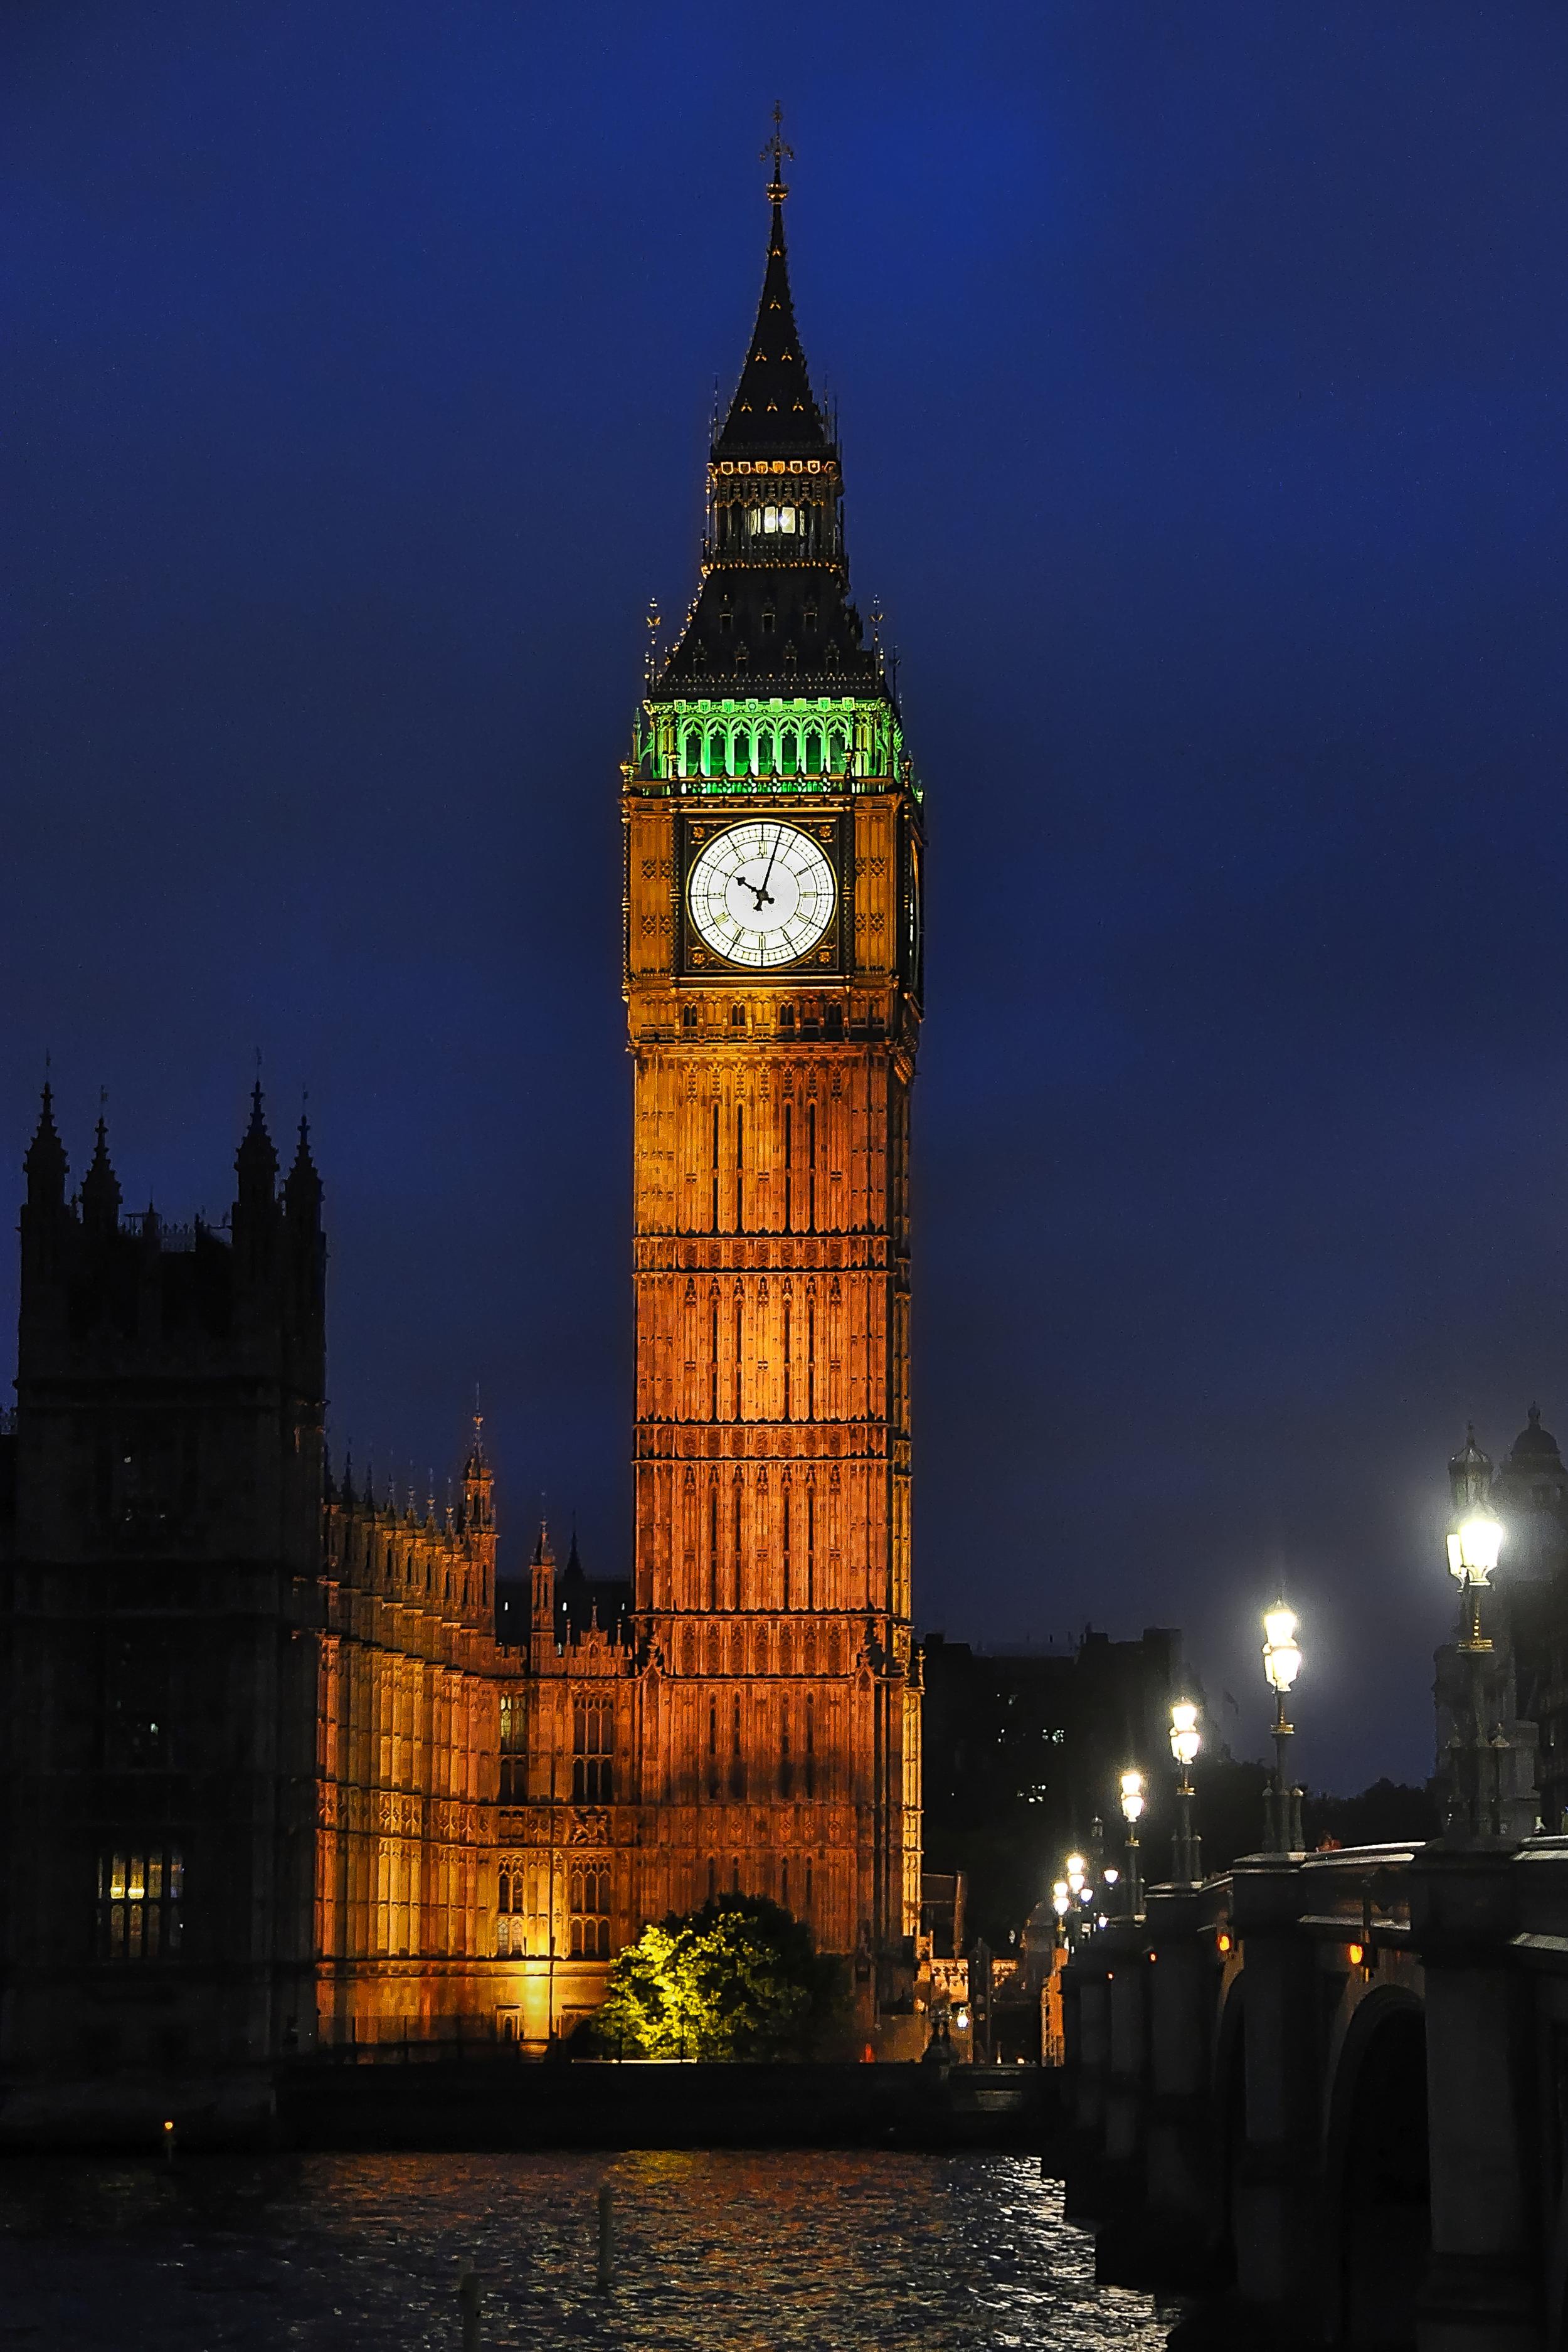 Timeless London - Big Ben (London, England)